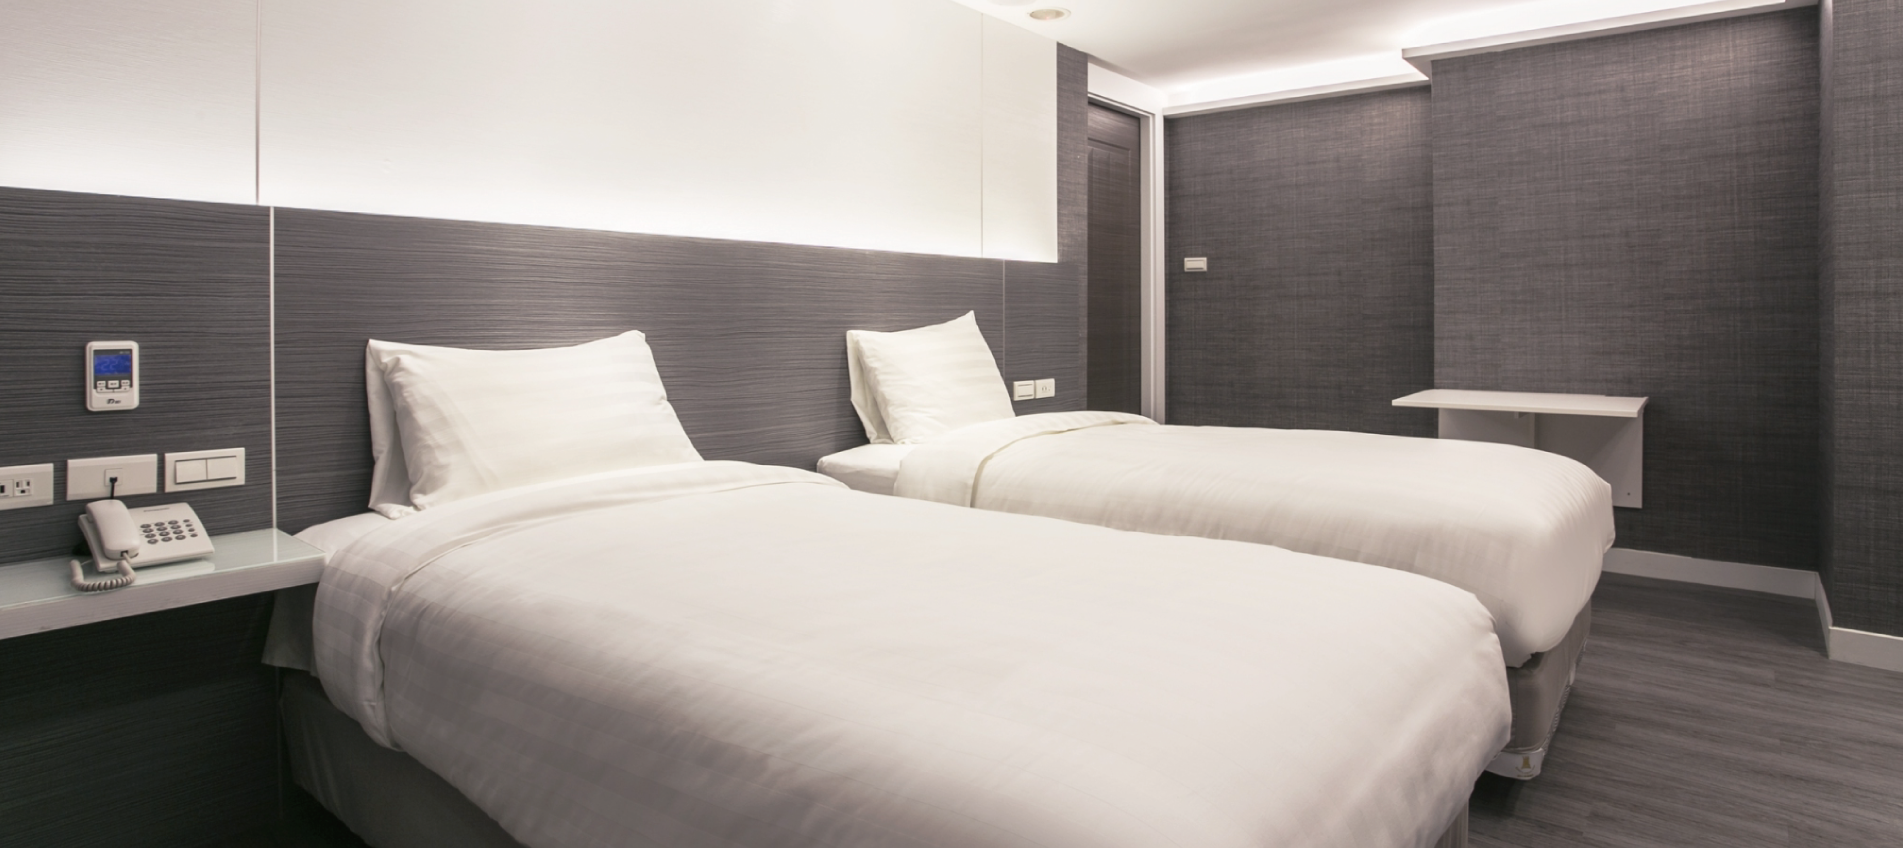 room_new2_01